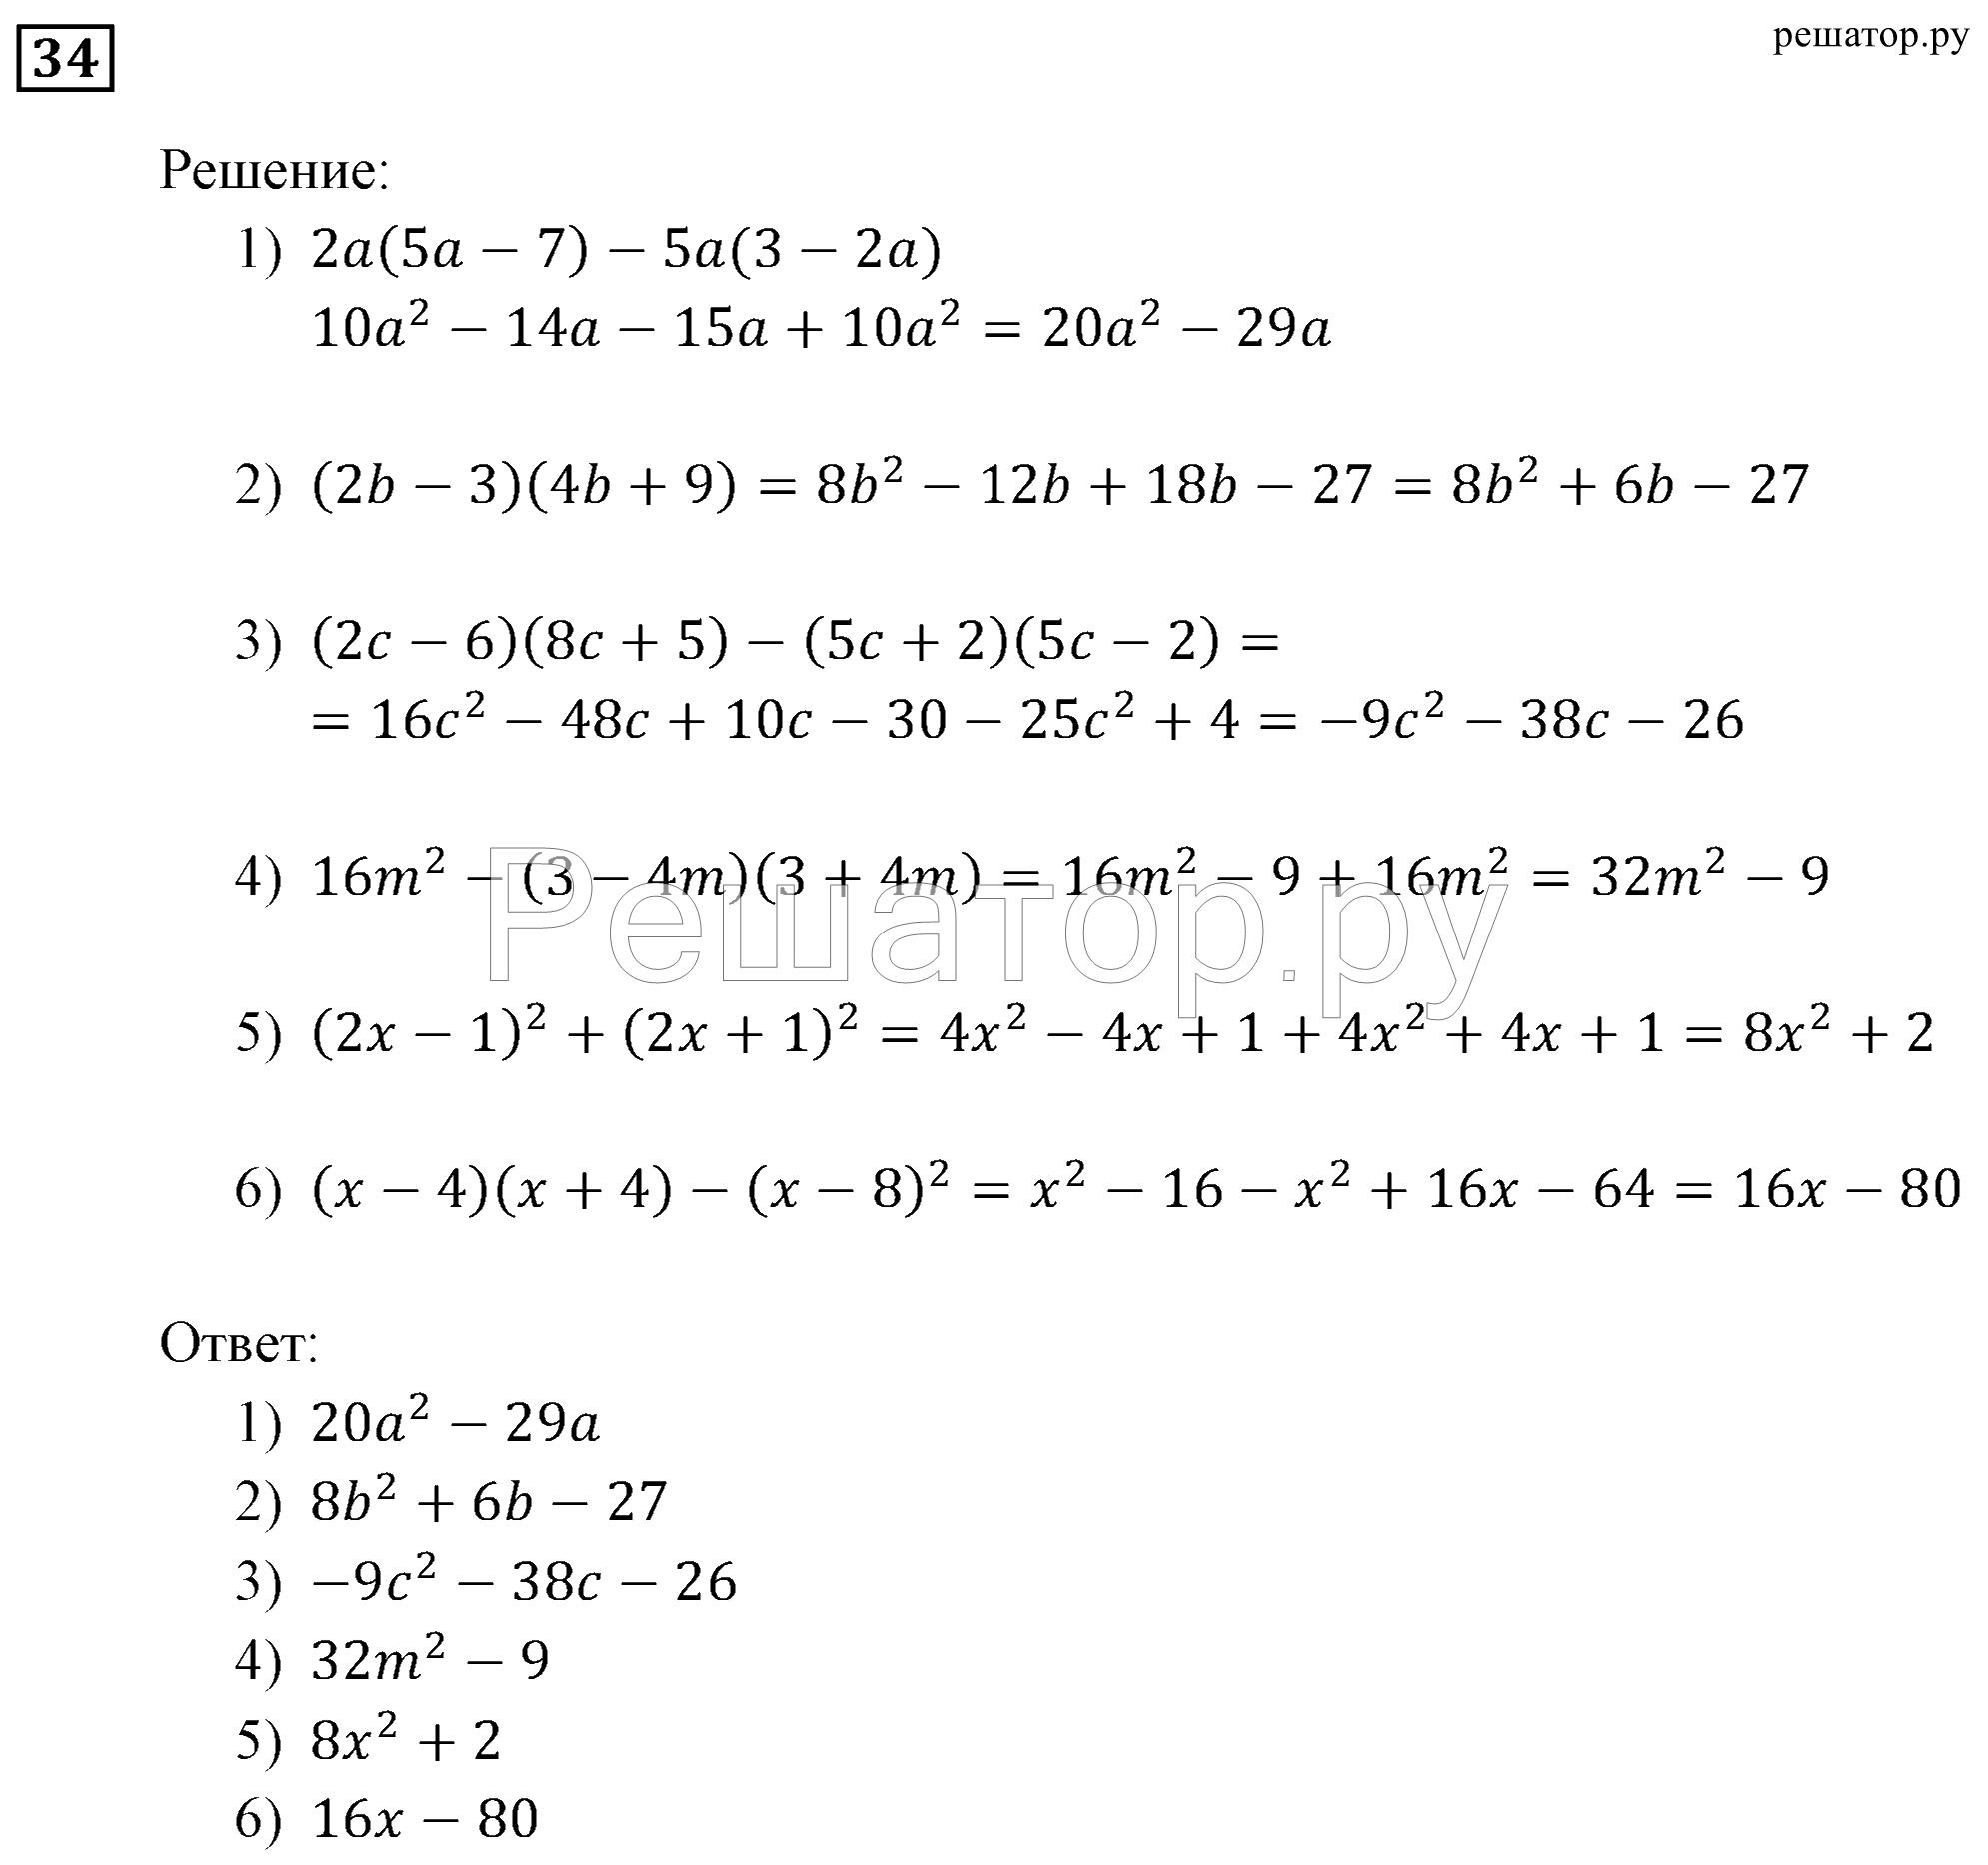 Решебник По Сборнику 9 Класс Алгебра Мерзляк Полонский Якир